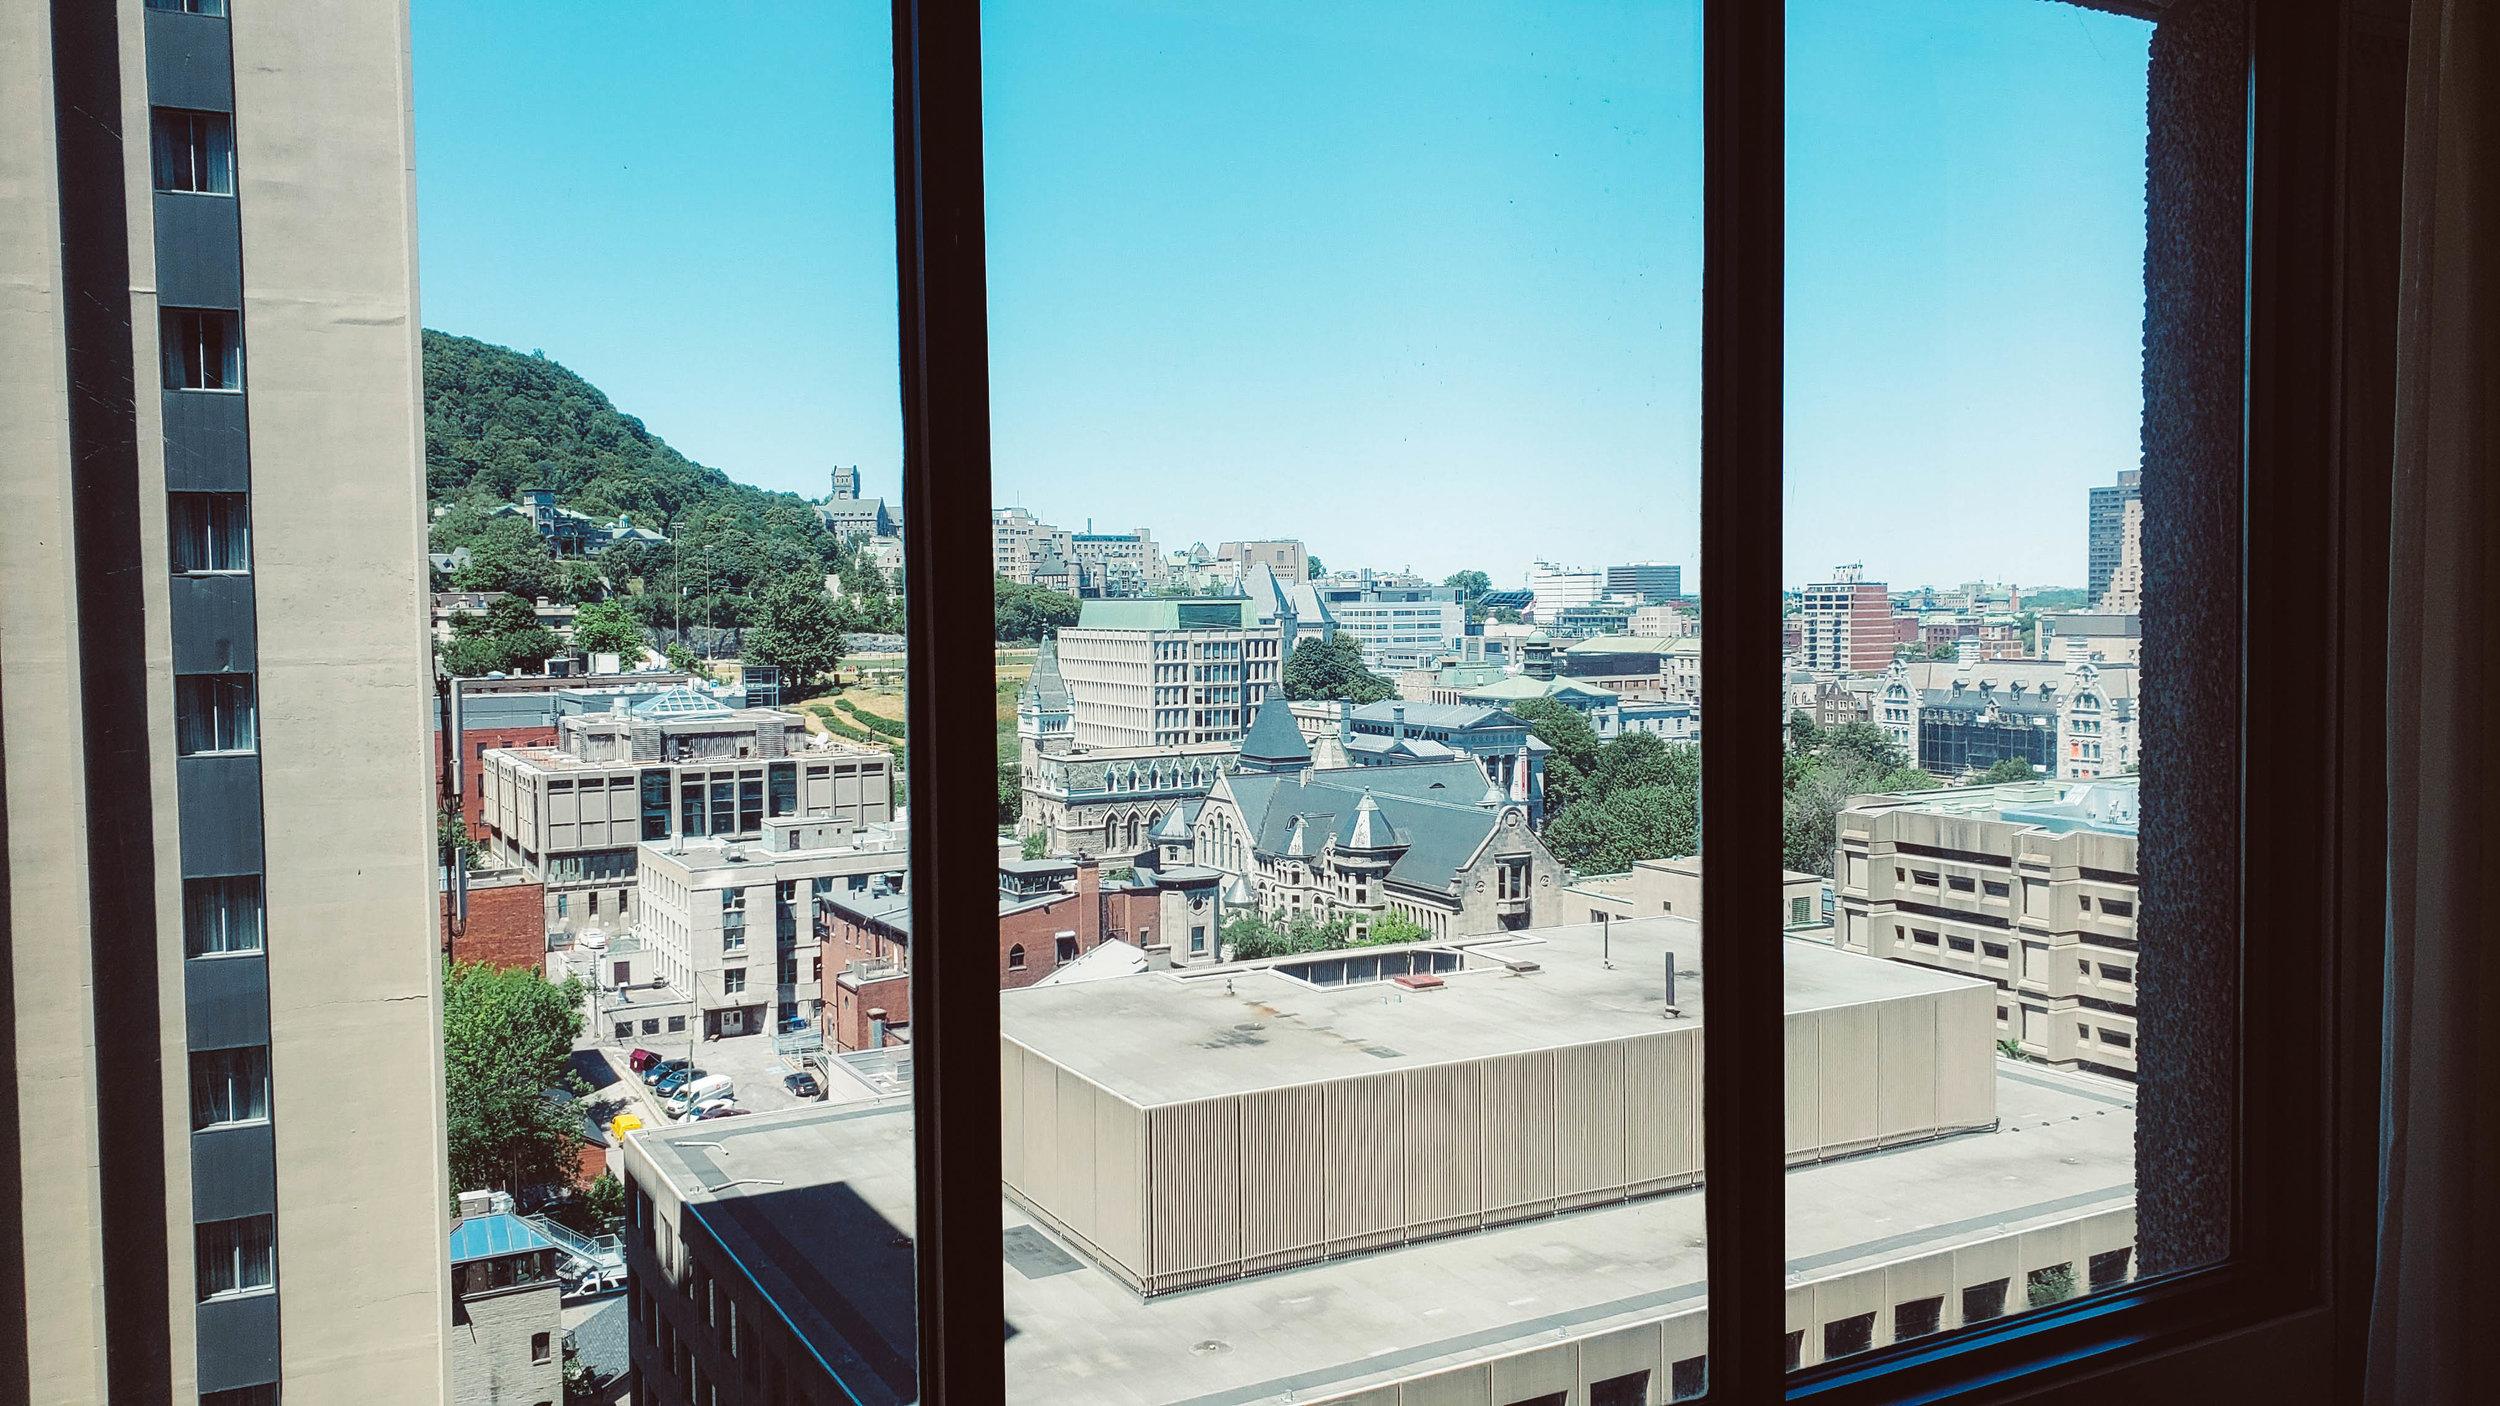 Omni Hotel Room View-125728.jpg